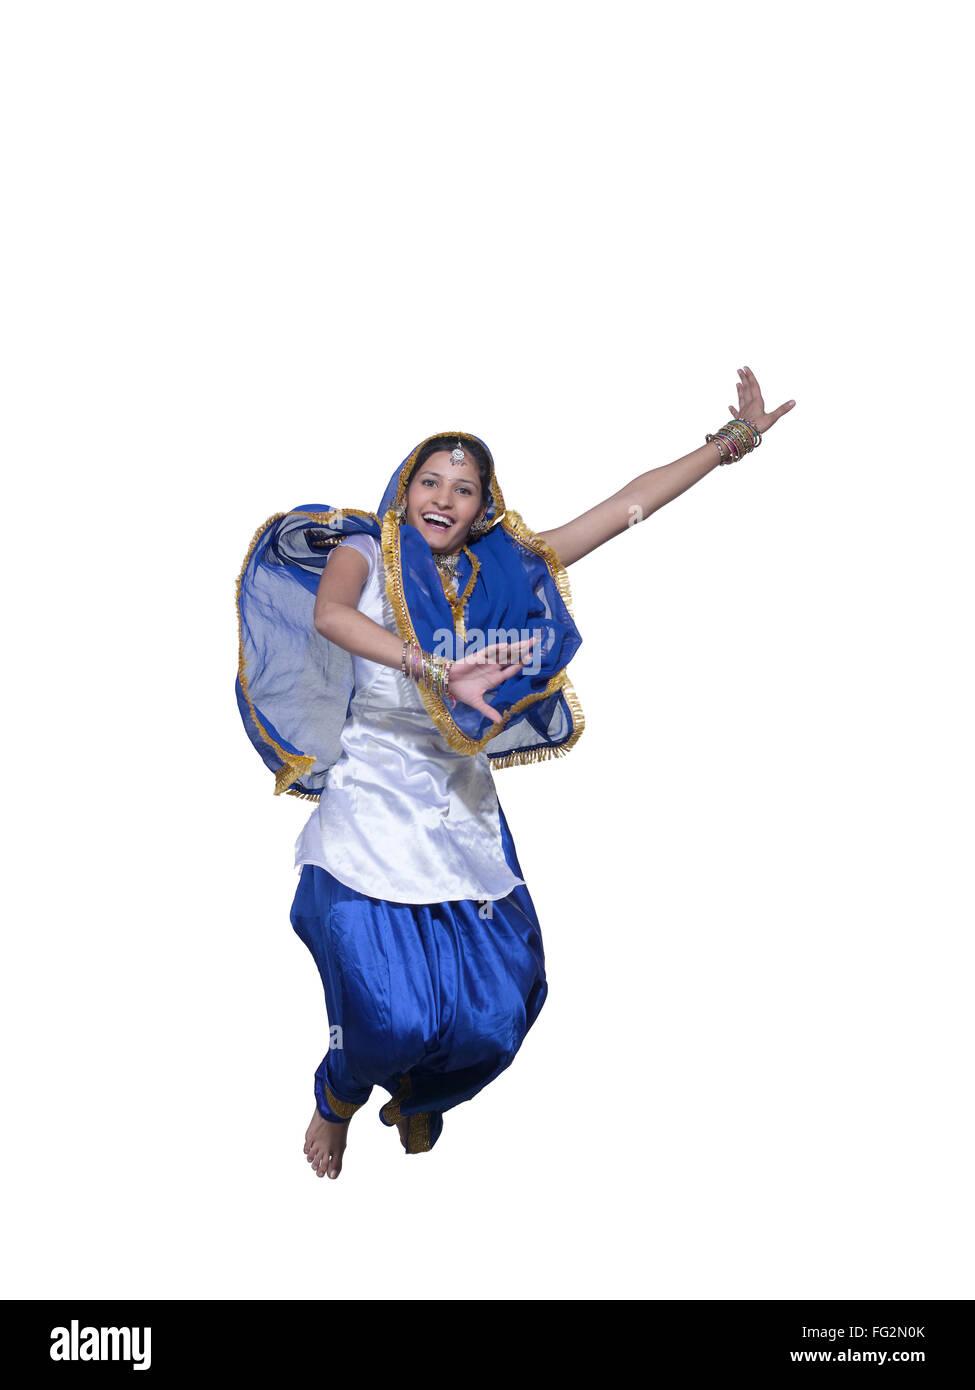 Dancer performing folk dance bhangra MR#779D - Stock Image